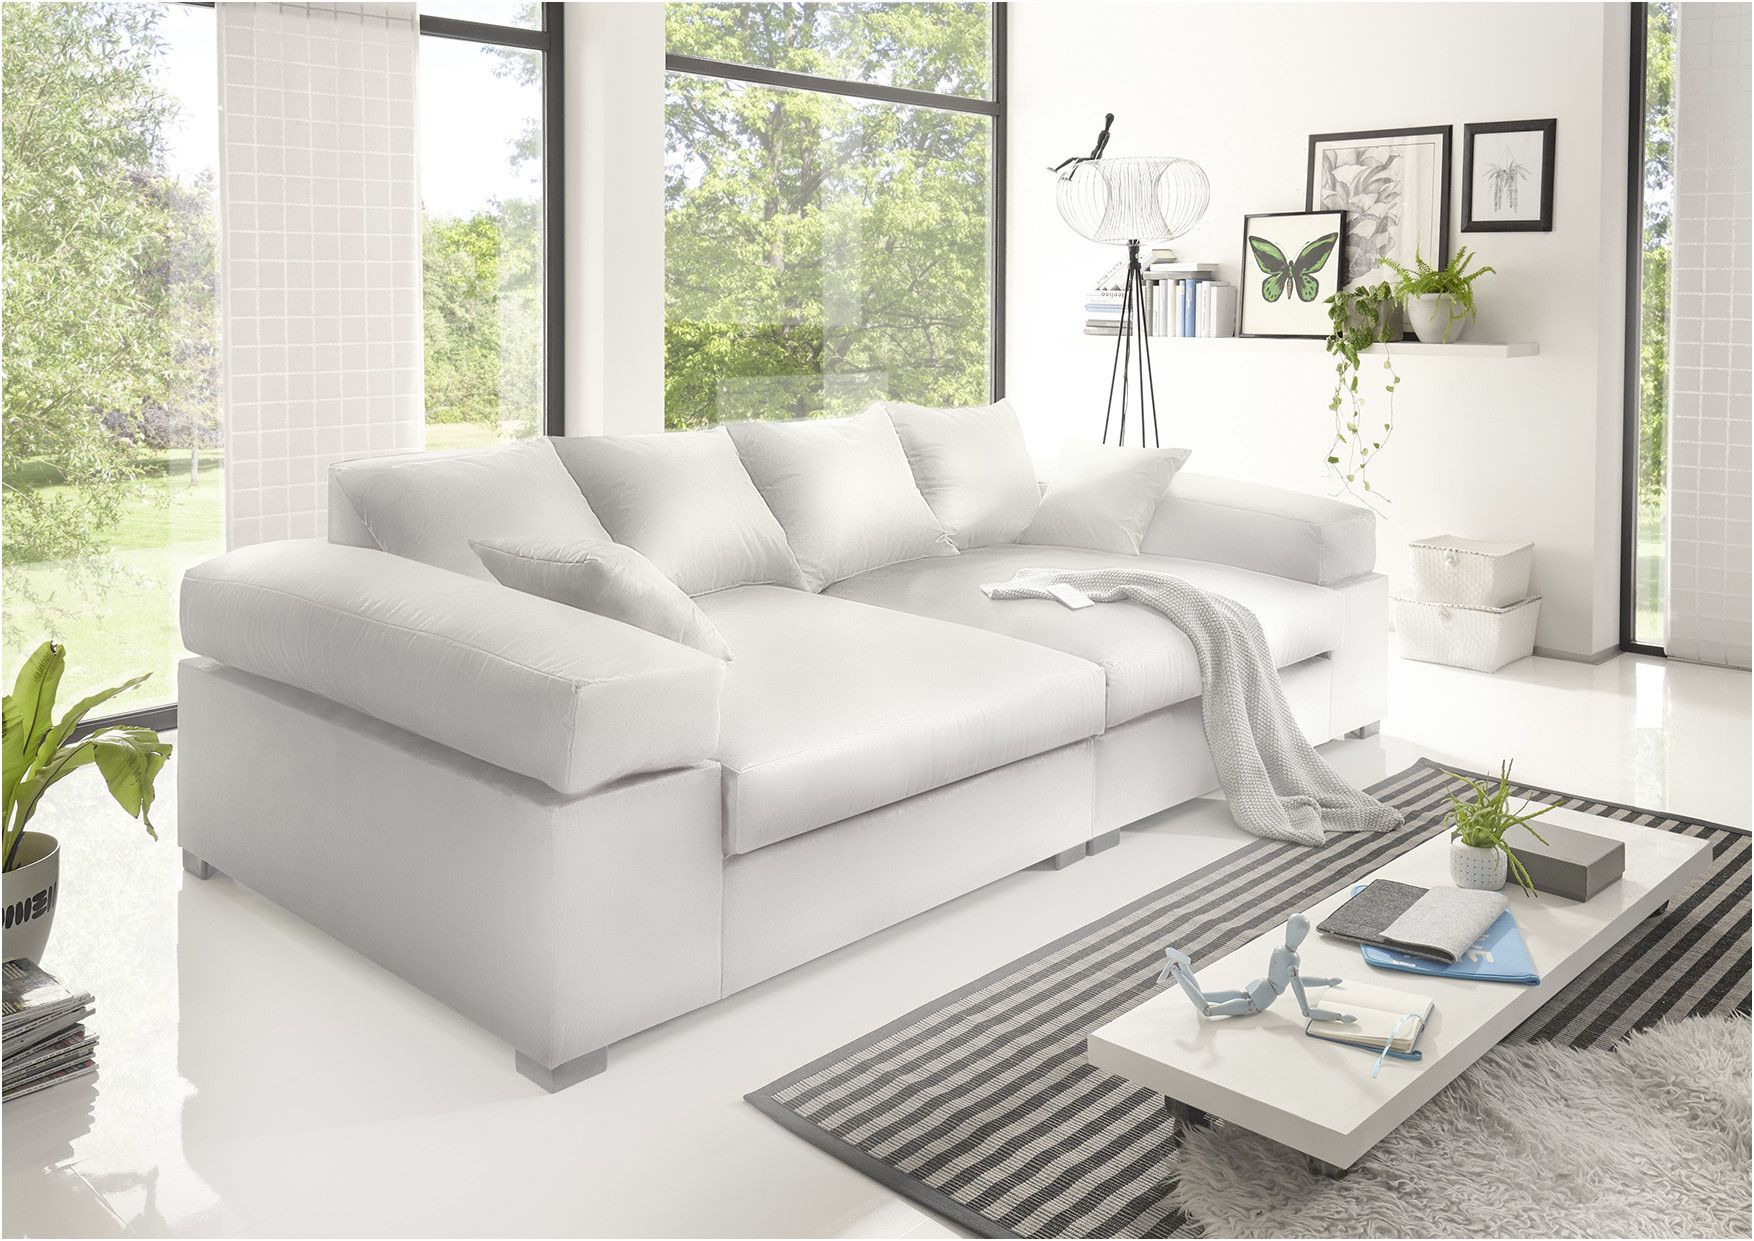 Big Sofa Couchgarnitur Megasofa Riesensofa Arezzo Kunstleder Weiss Di 2020